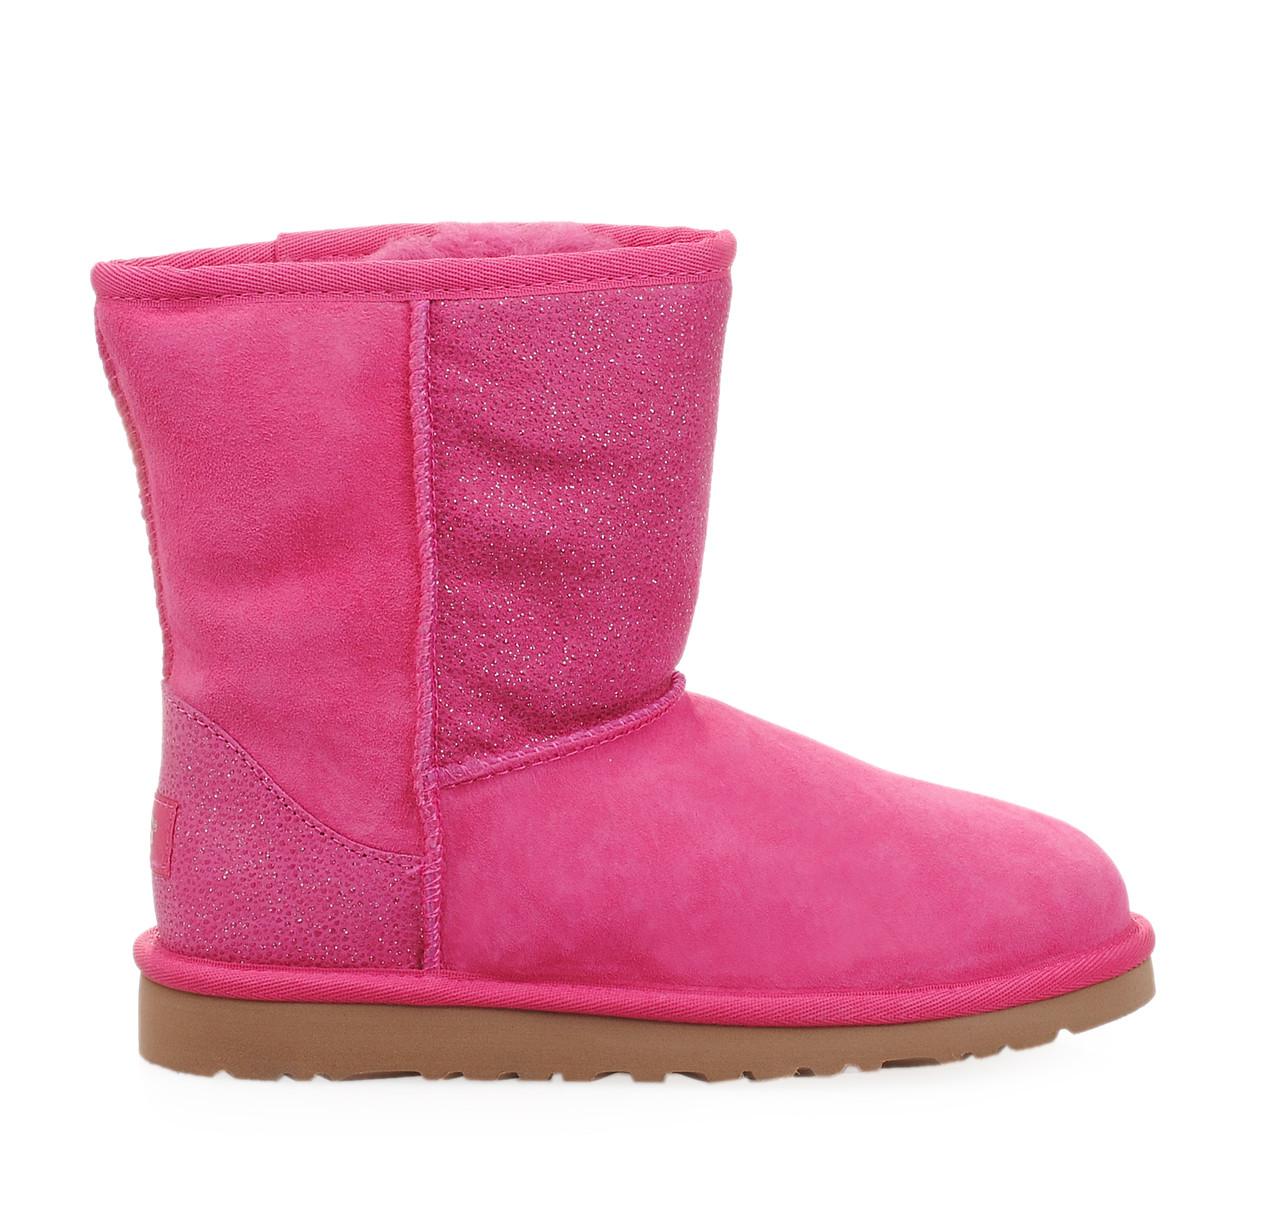 f0a350d2ef0 Παιδικά > Κορίτσια > Παπούτσια > Μπότες / ΠΑΙΔΙΚΕΣ ΜΠΟΤΕΣ ΚΟΡΙΤΣΙ ...